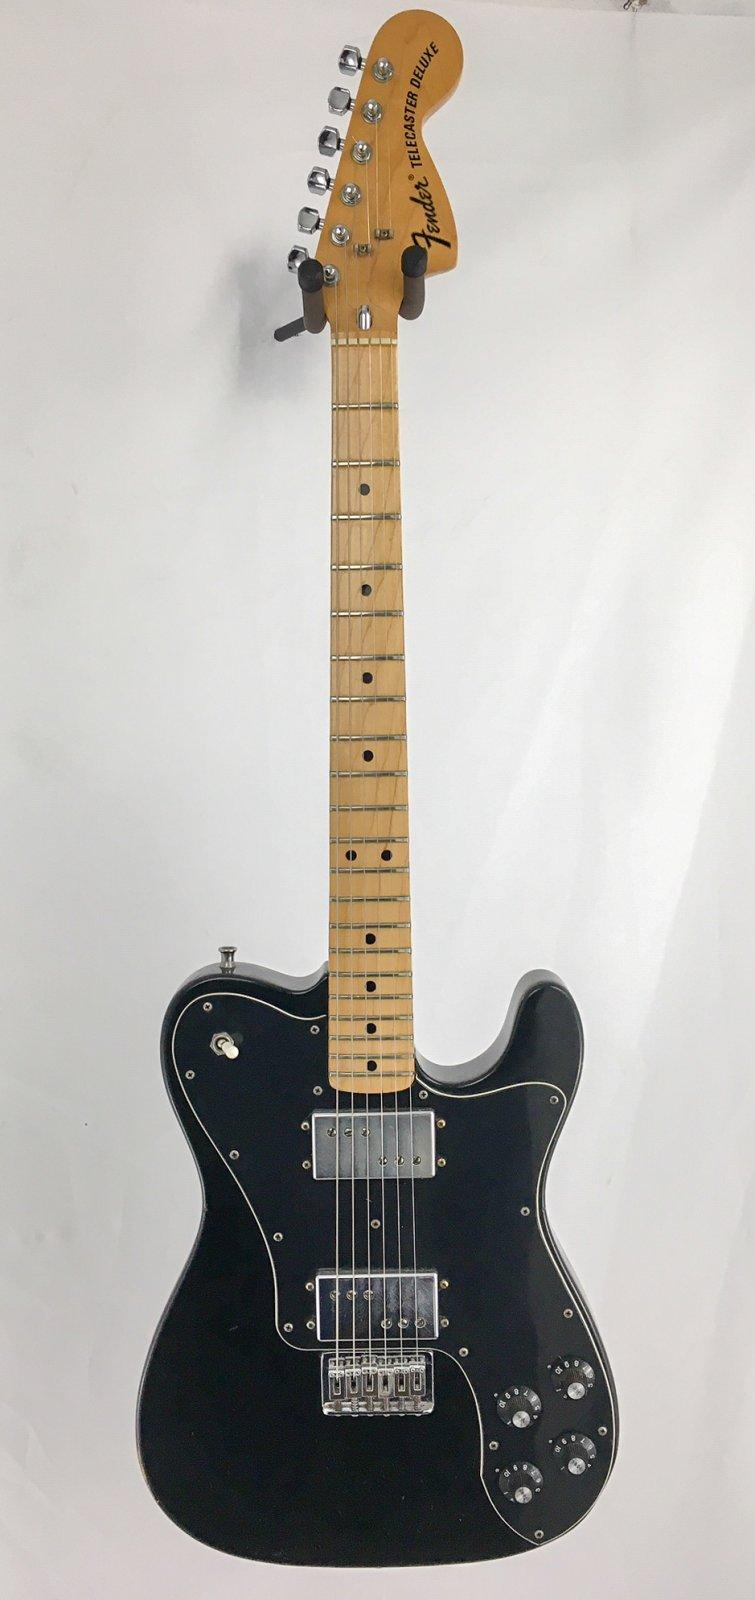 Vintage 1973 Fender Telecaster Deluxe